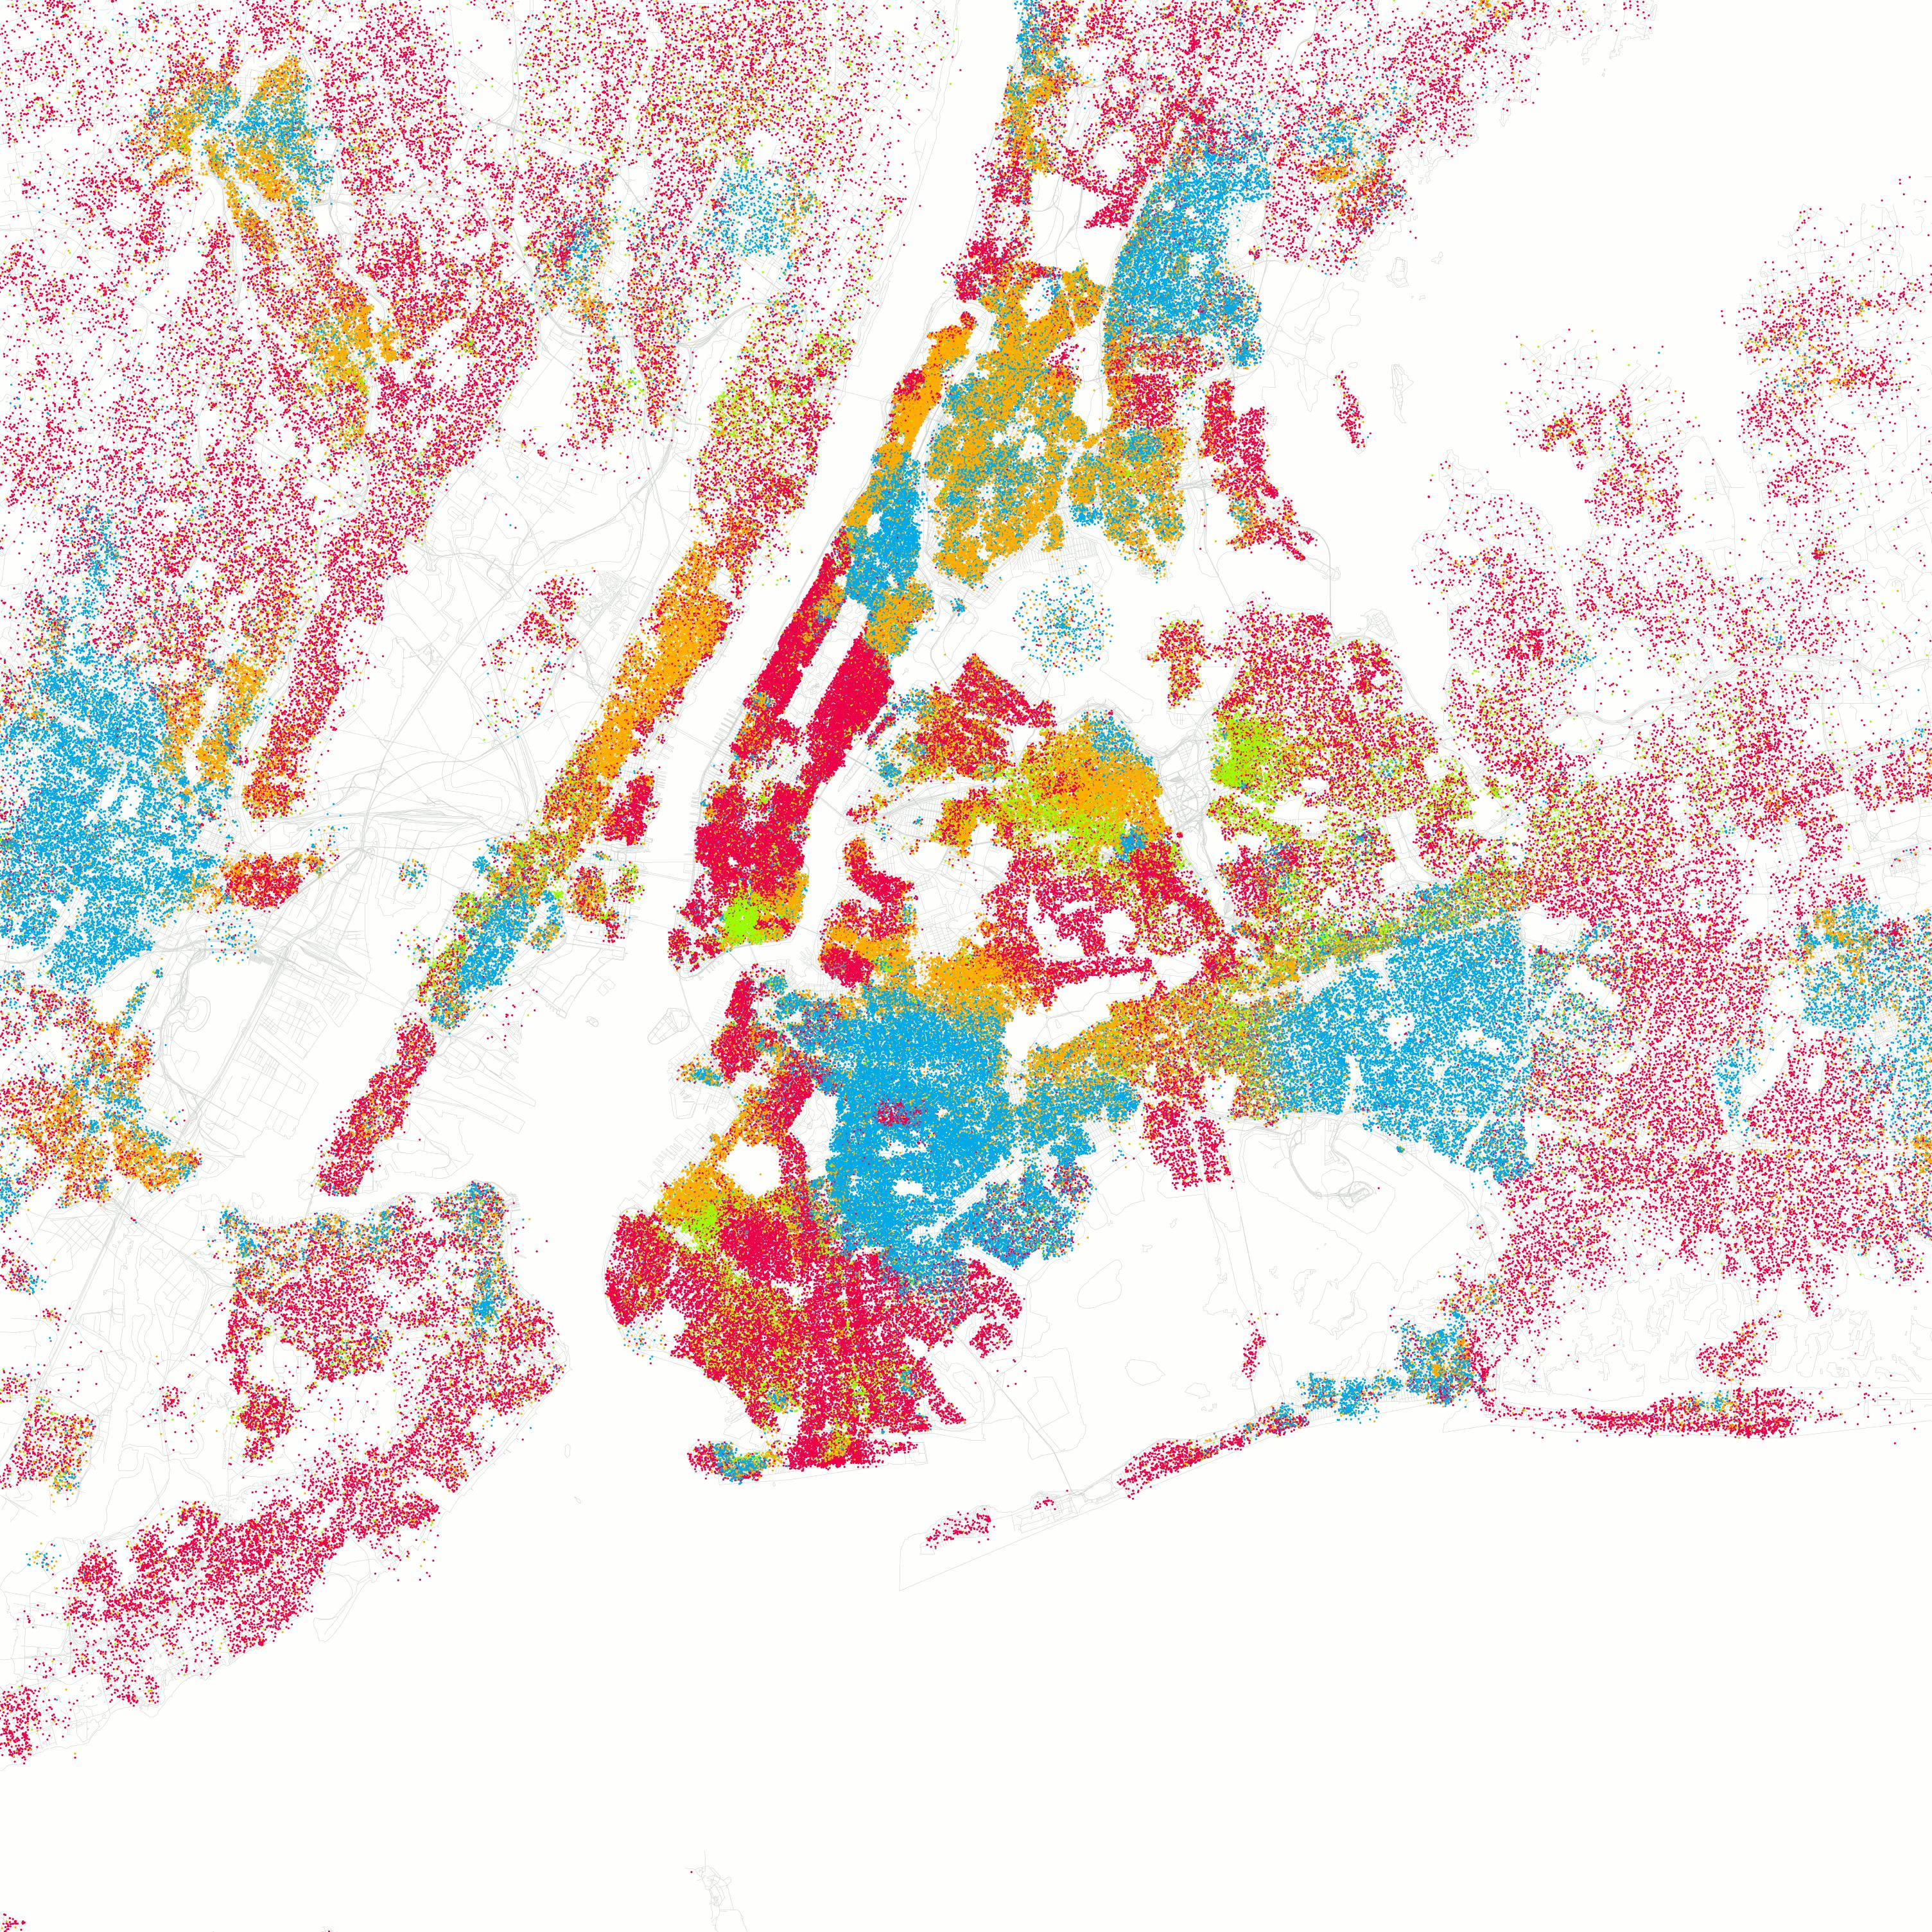 Staat New York City in New York City im Jahr